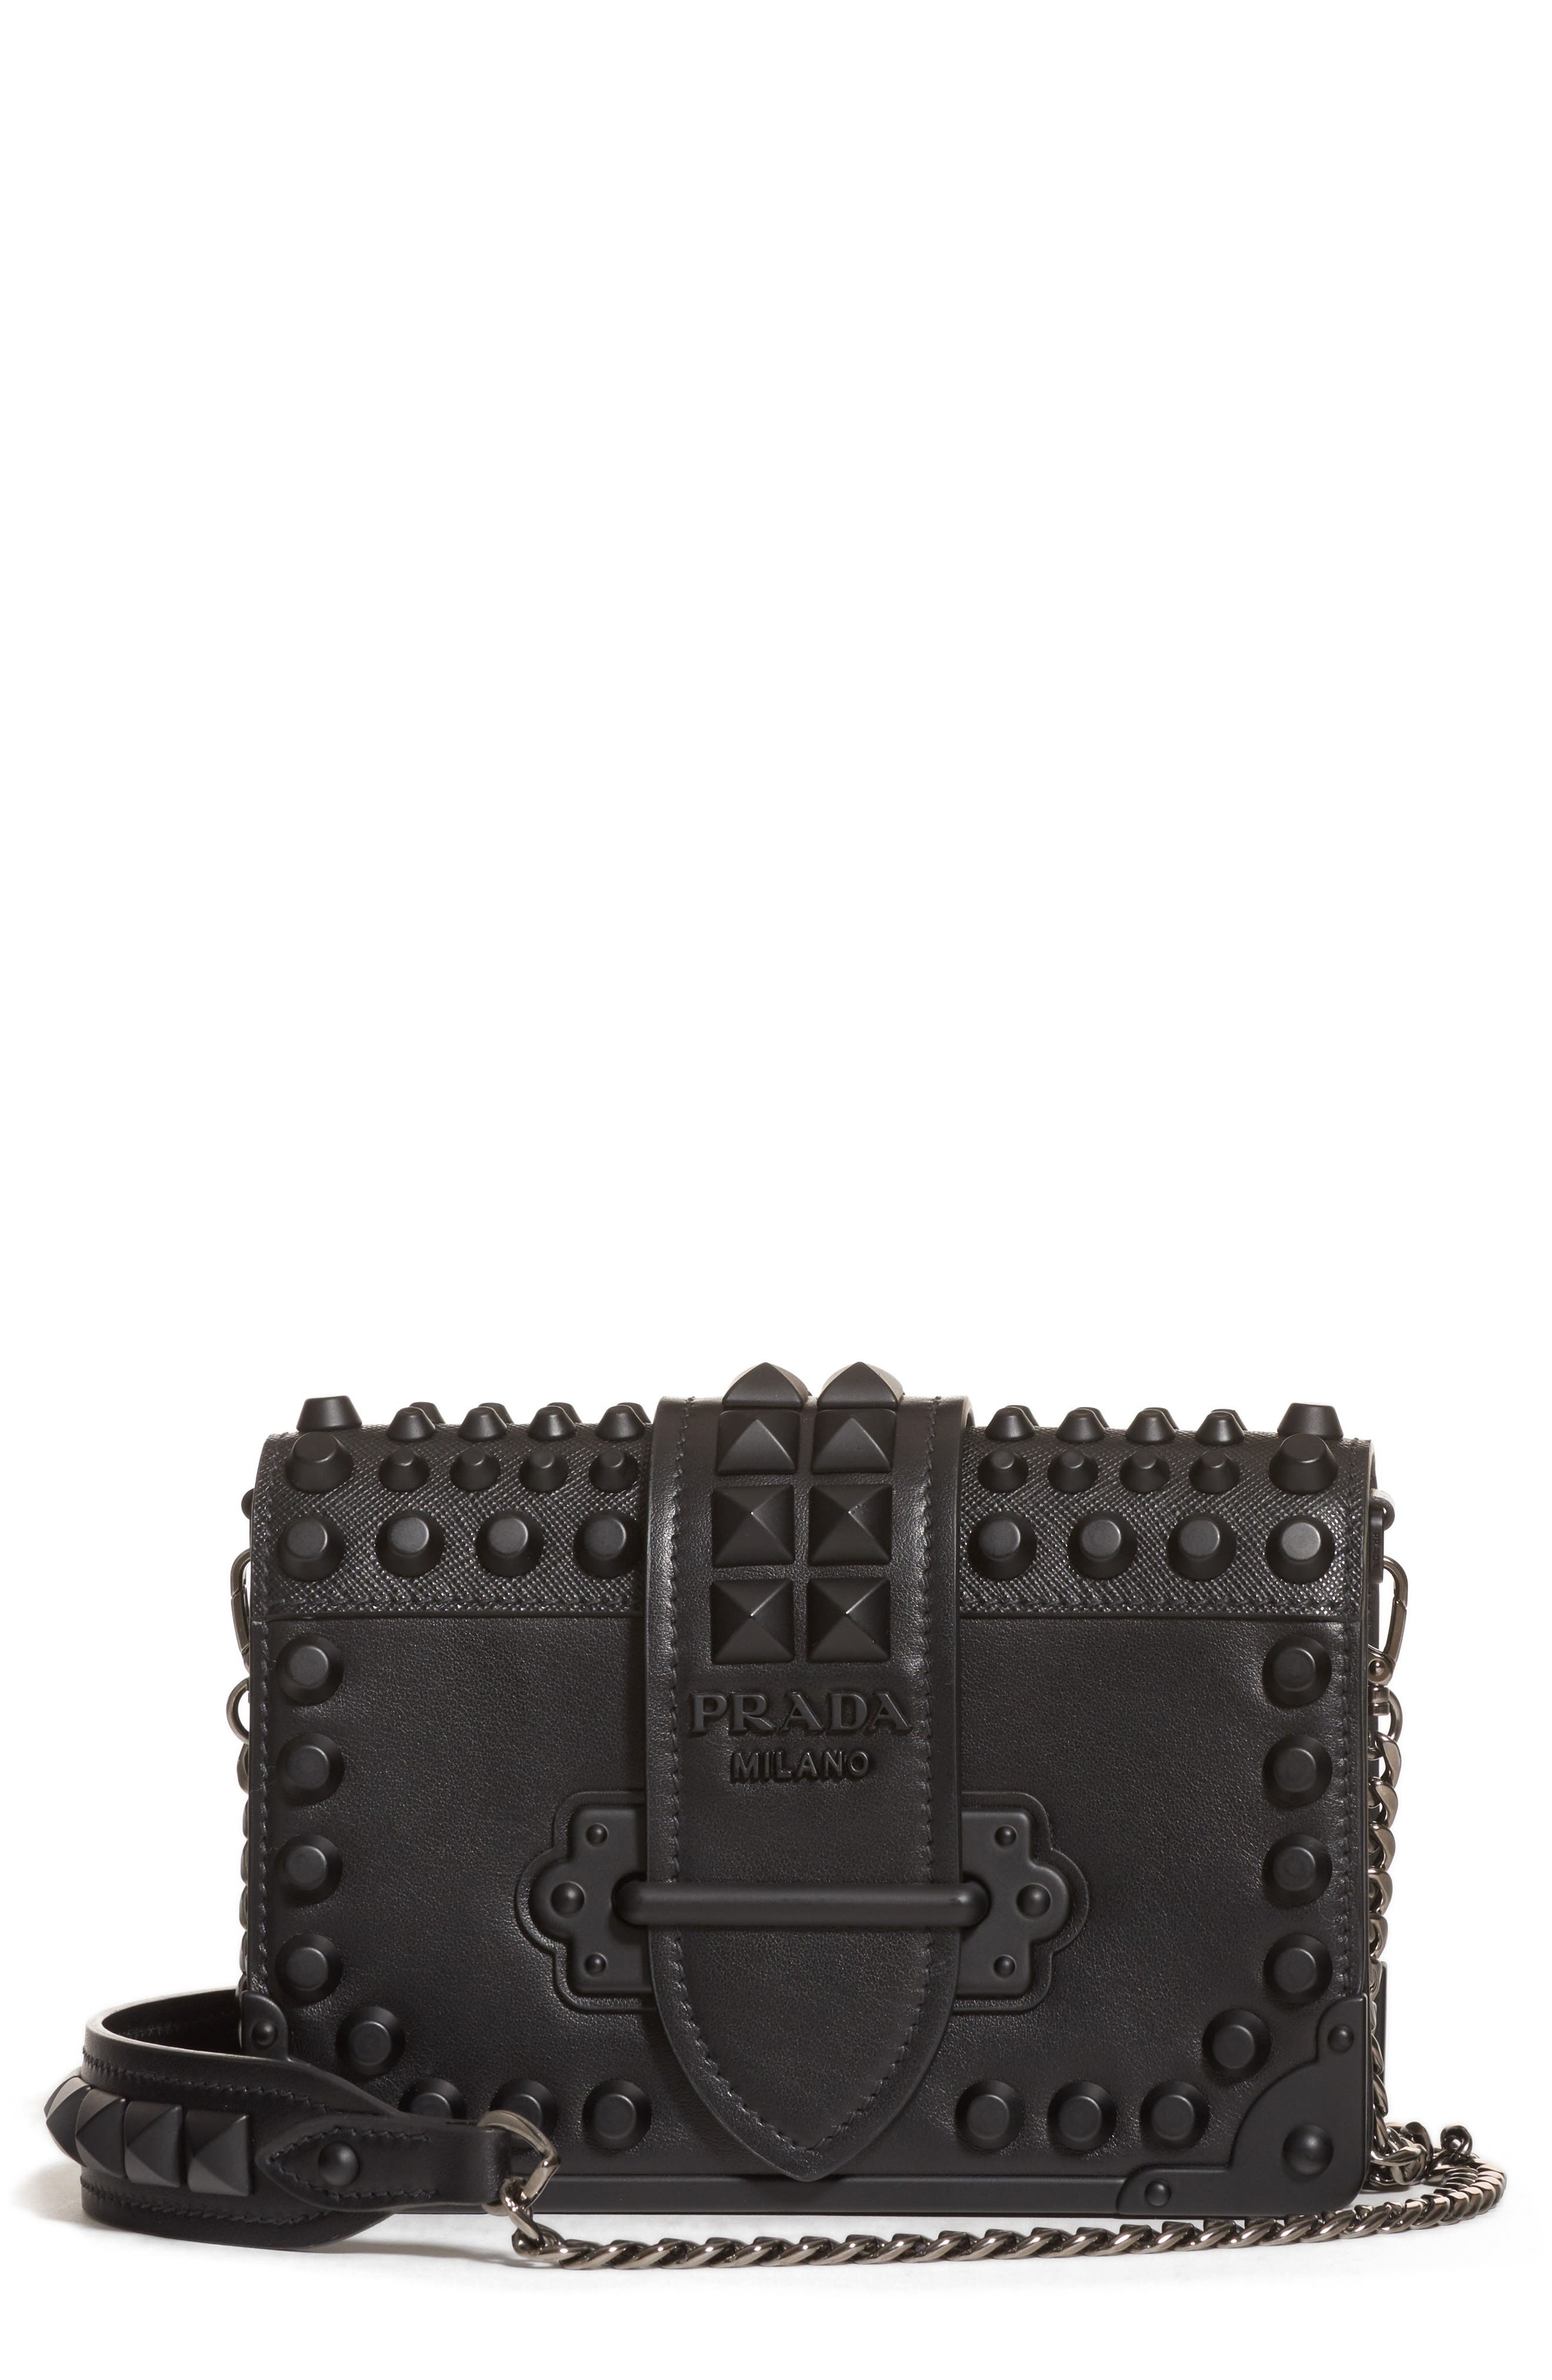 PRADA,                             Cahier Studded Leather Crossbody Bag,                             Main thumbnail 1, color,                             NERO/ NERO